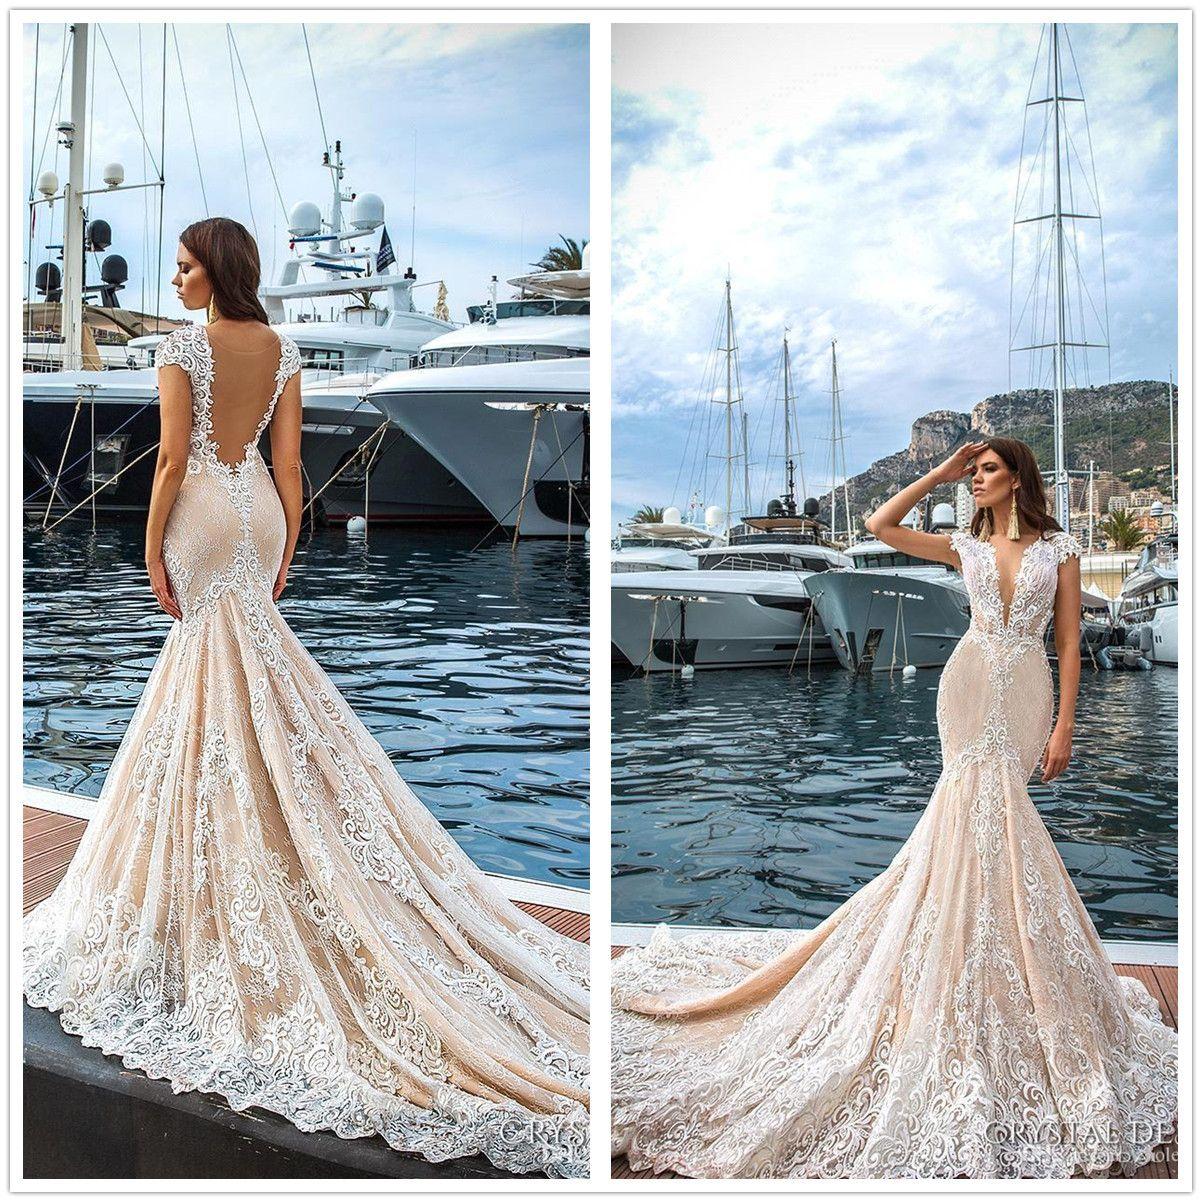 Lace Mermaid Wedding Dresses 2018 Plunging V Neck Crystal Design Cap ...